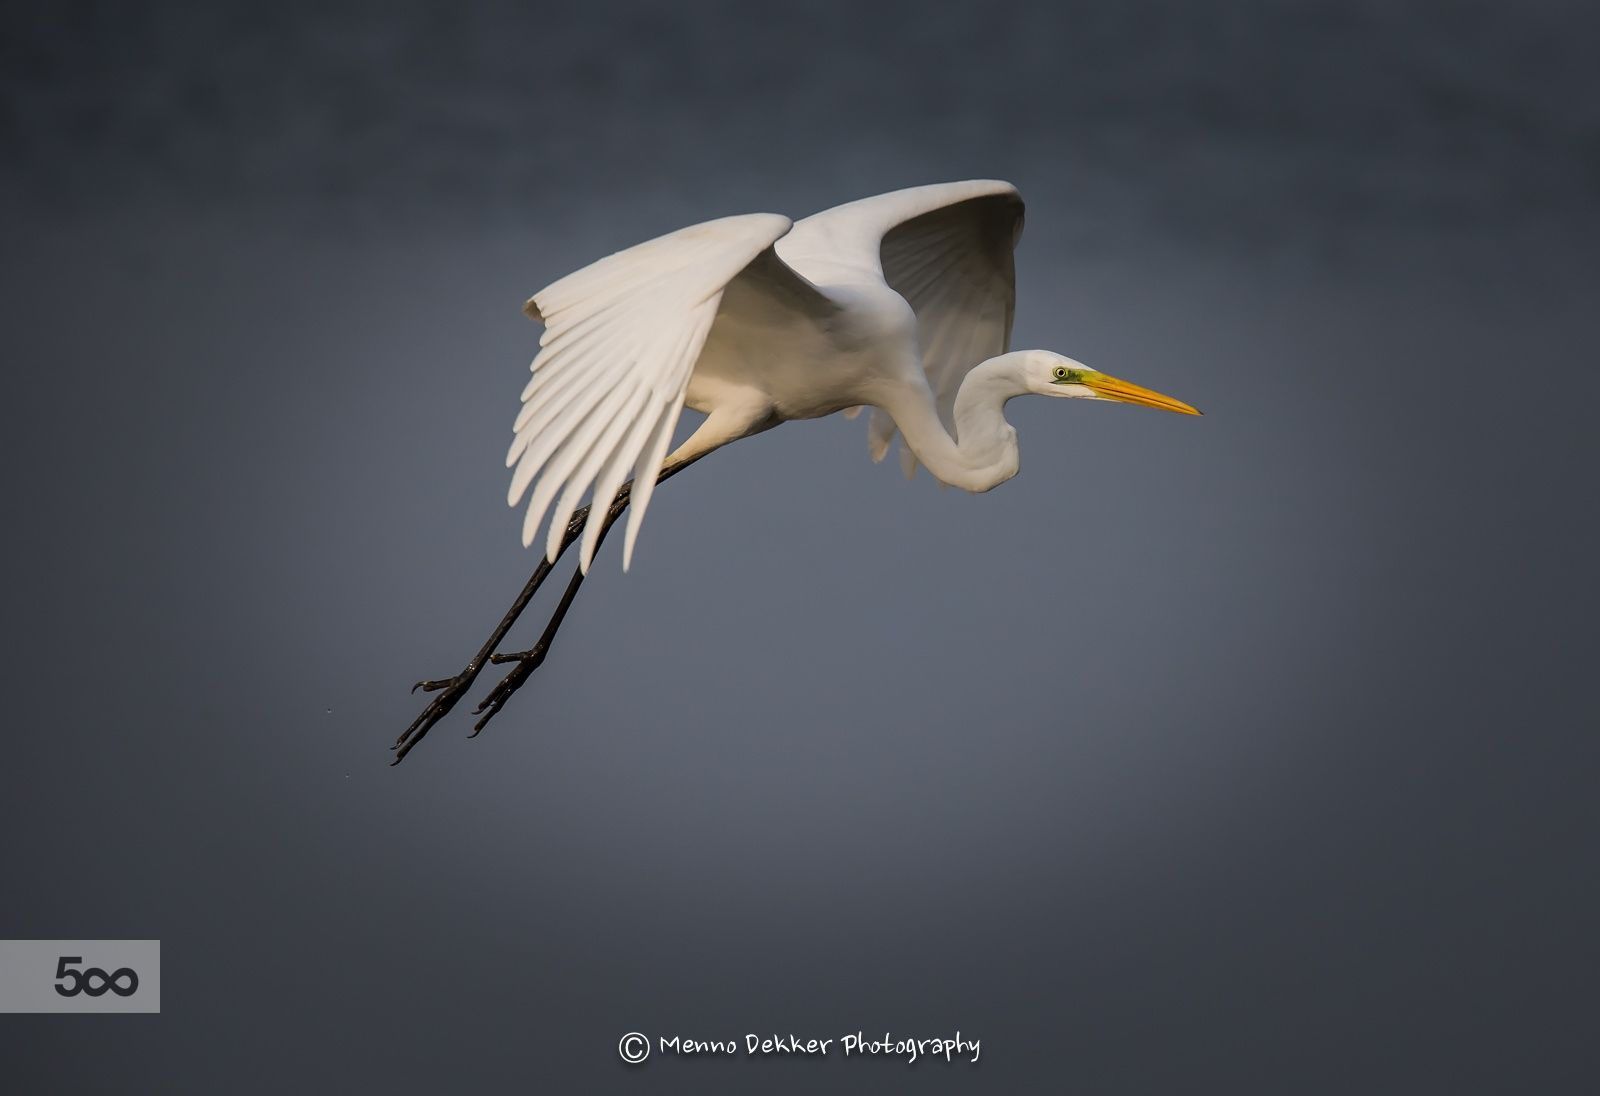 Great white Egret in flight by Menno Dekker on 500px